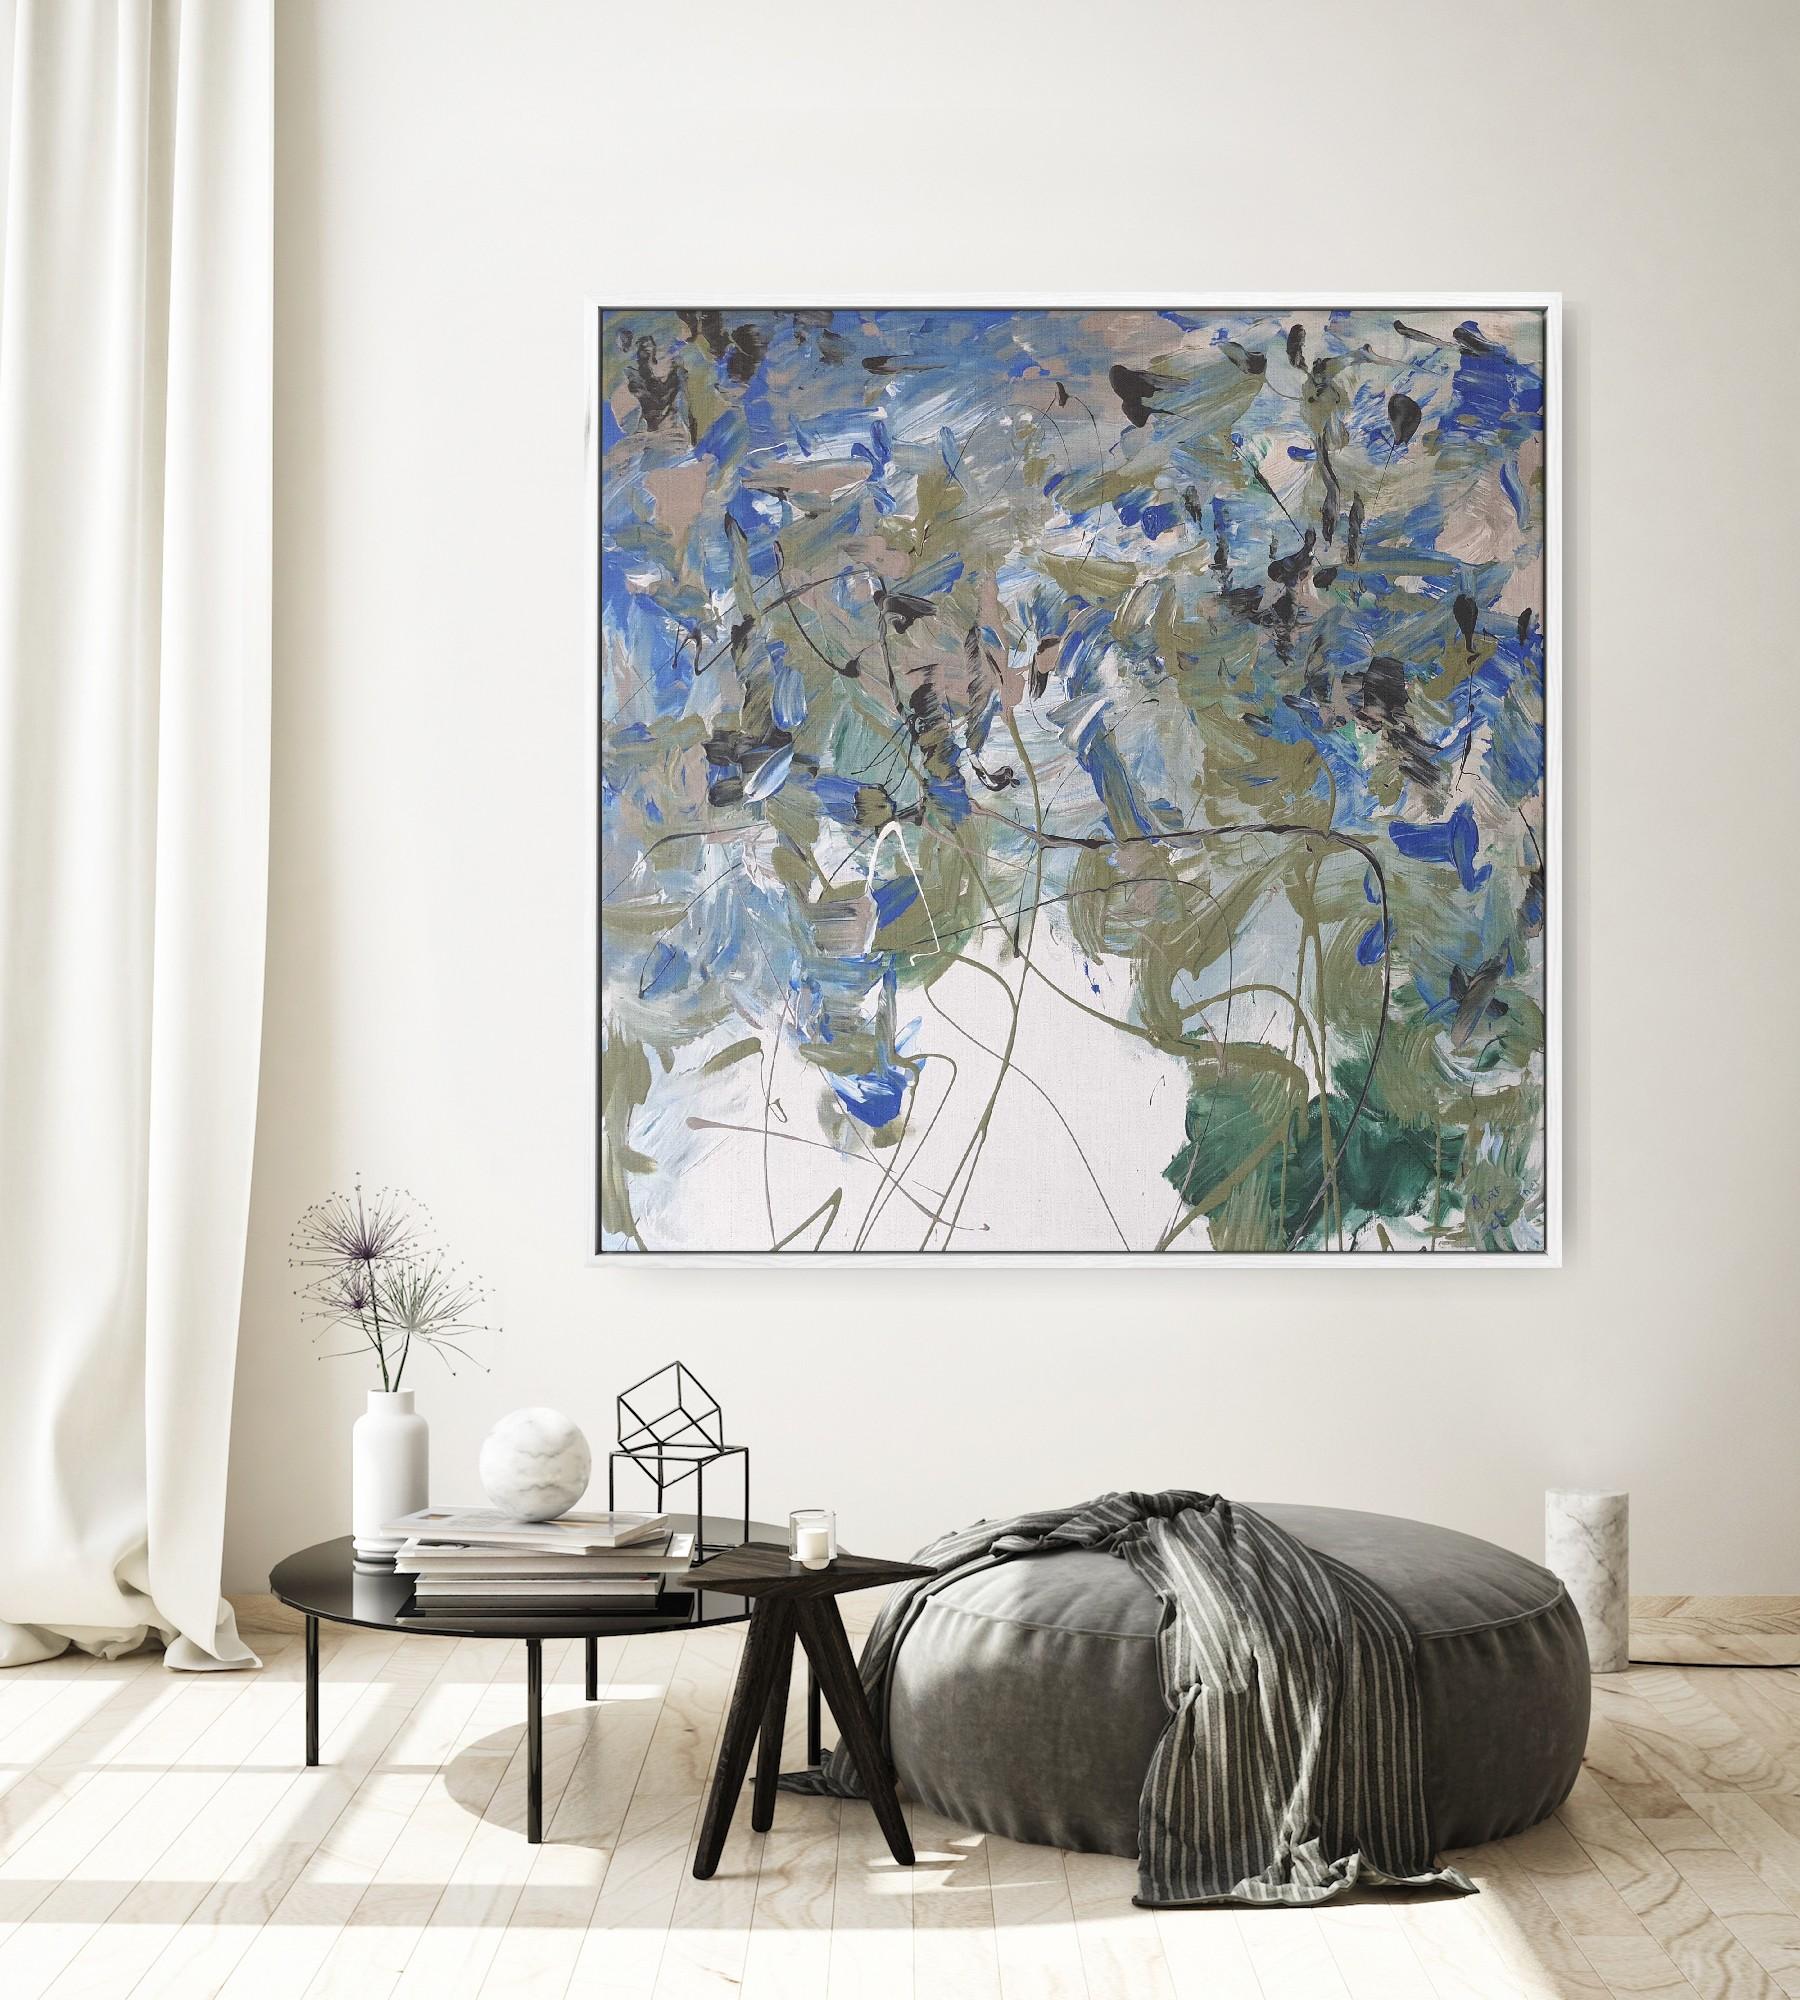 Gabriela Azar Schreiner Large Painting Abstract Art 11dsg4